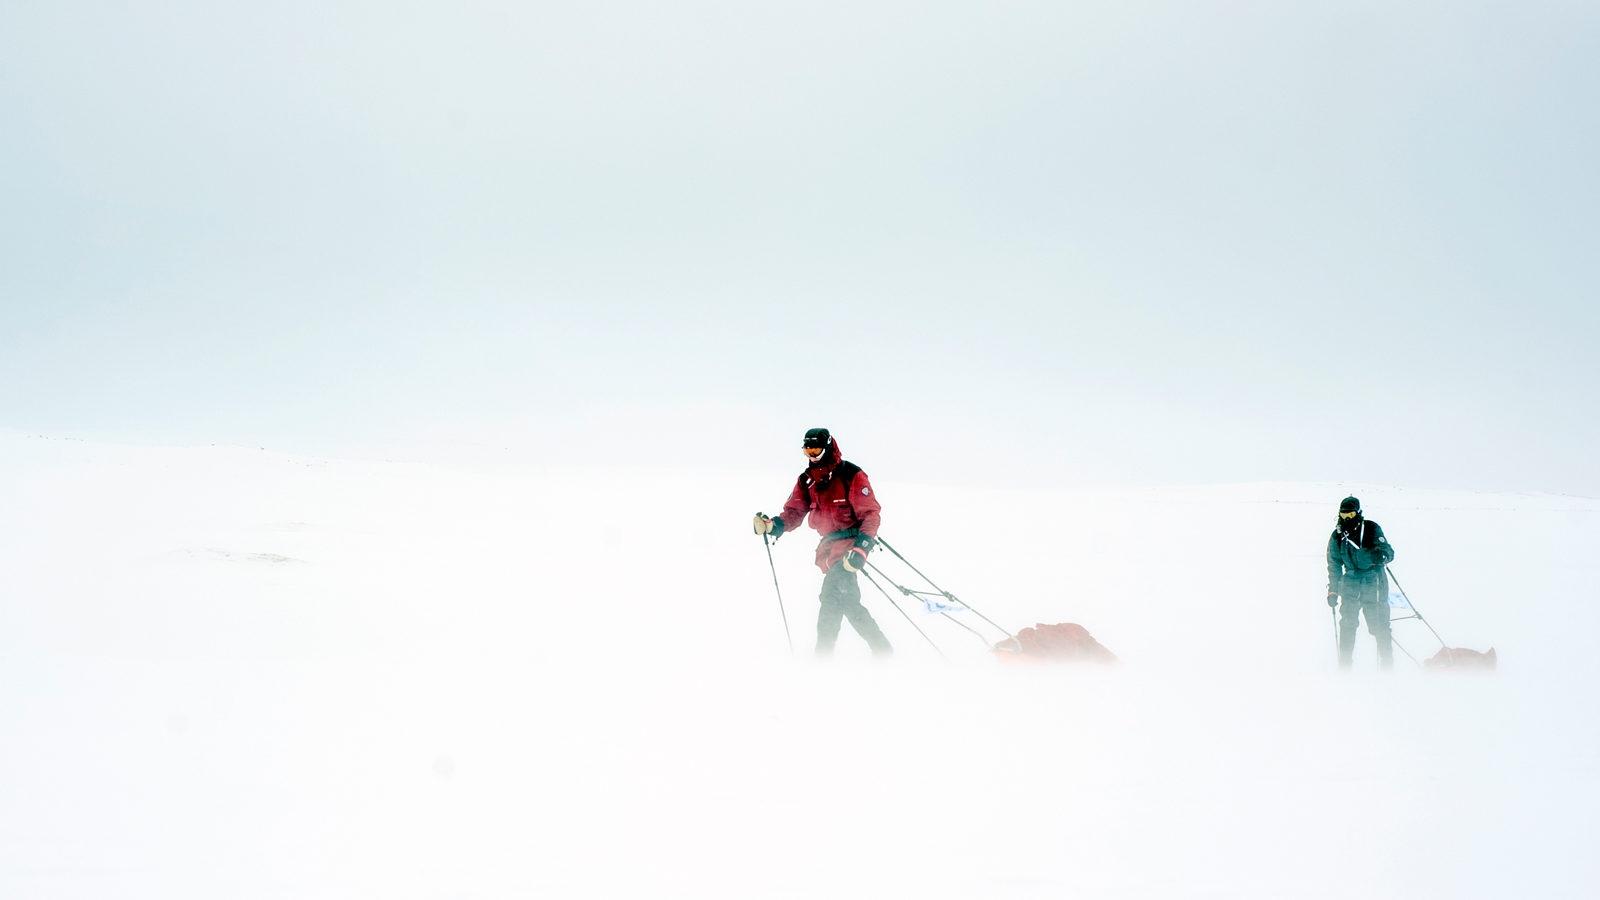 Miljøbilde_Amundsen-Expedition_2013_1920x1080_02-1920x900.jpg